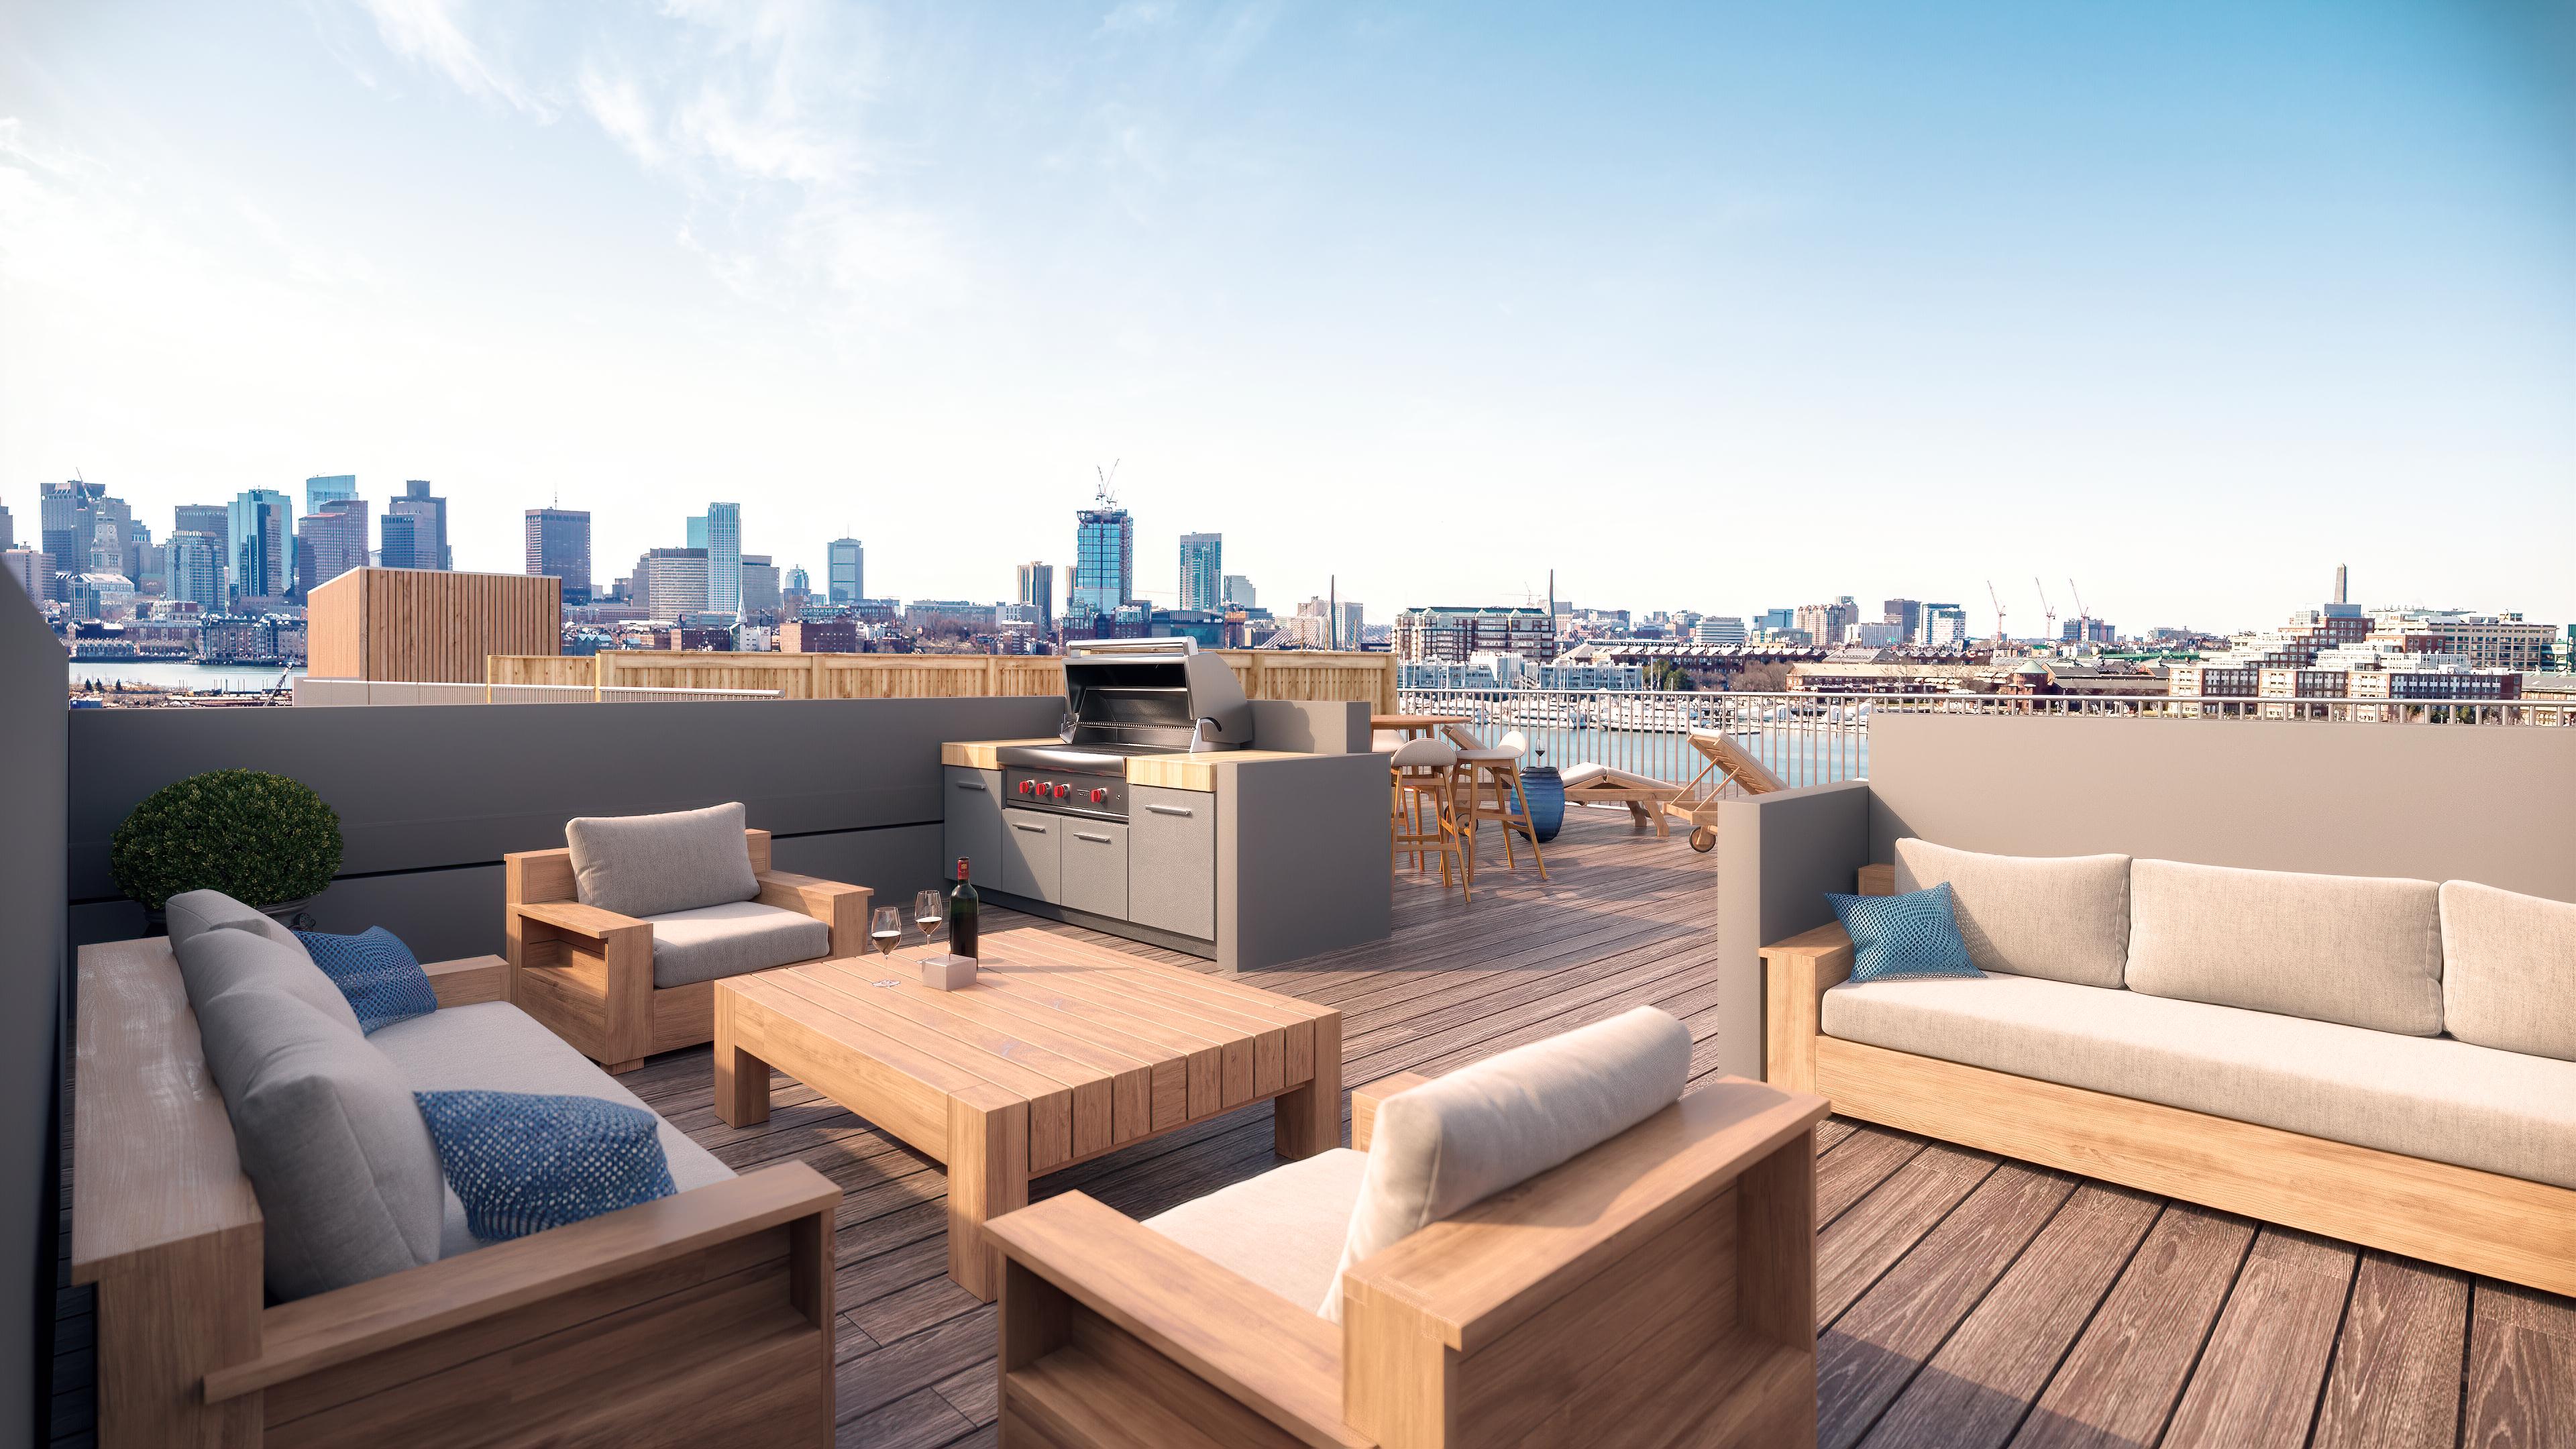 mira luxury condos east boston roof deck